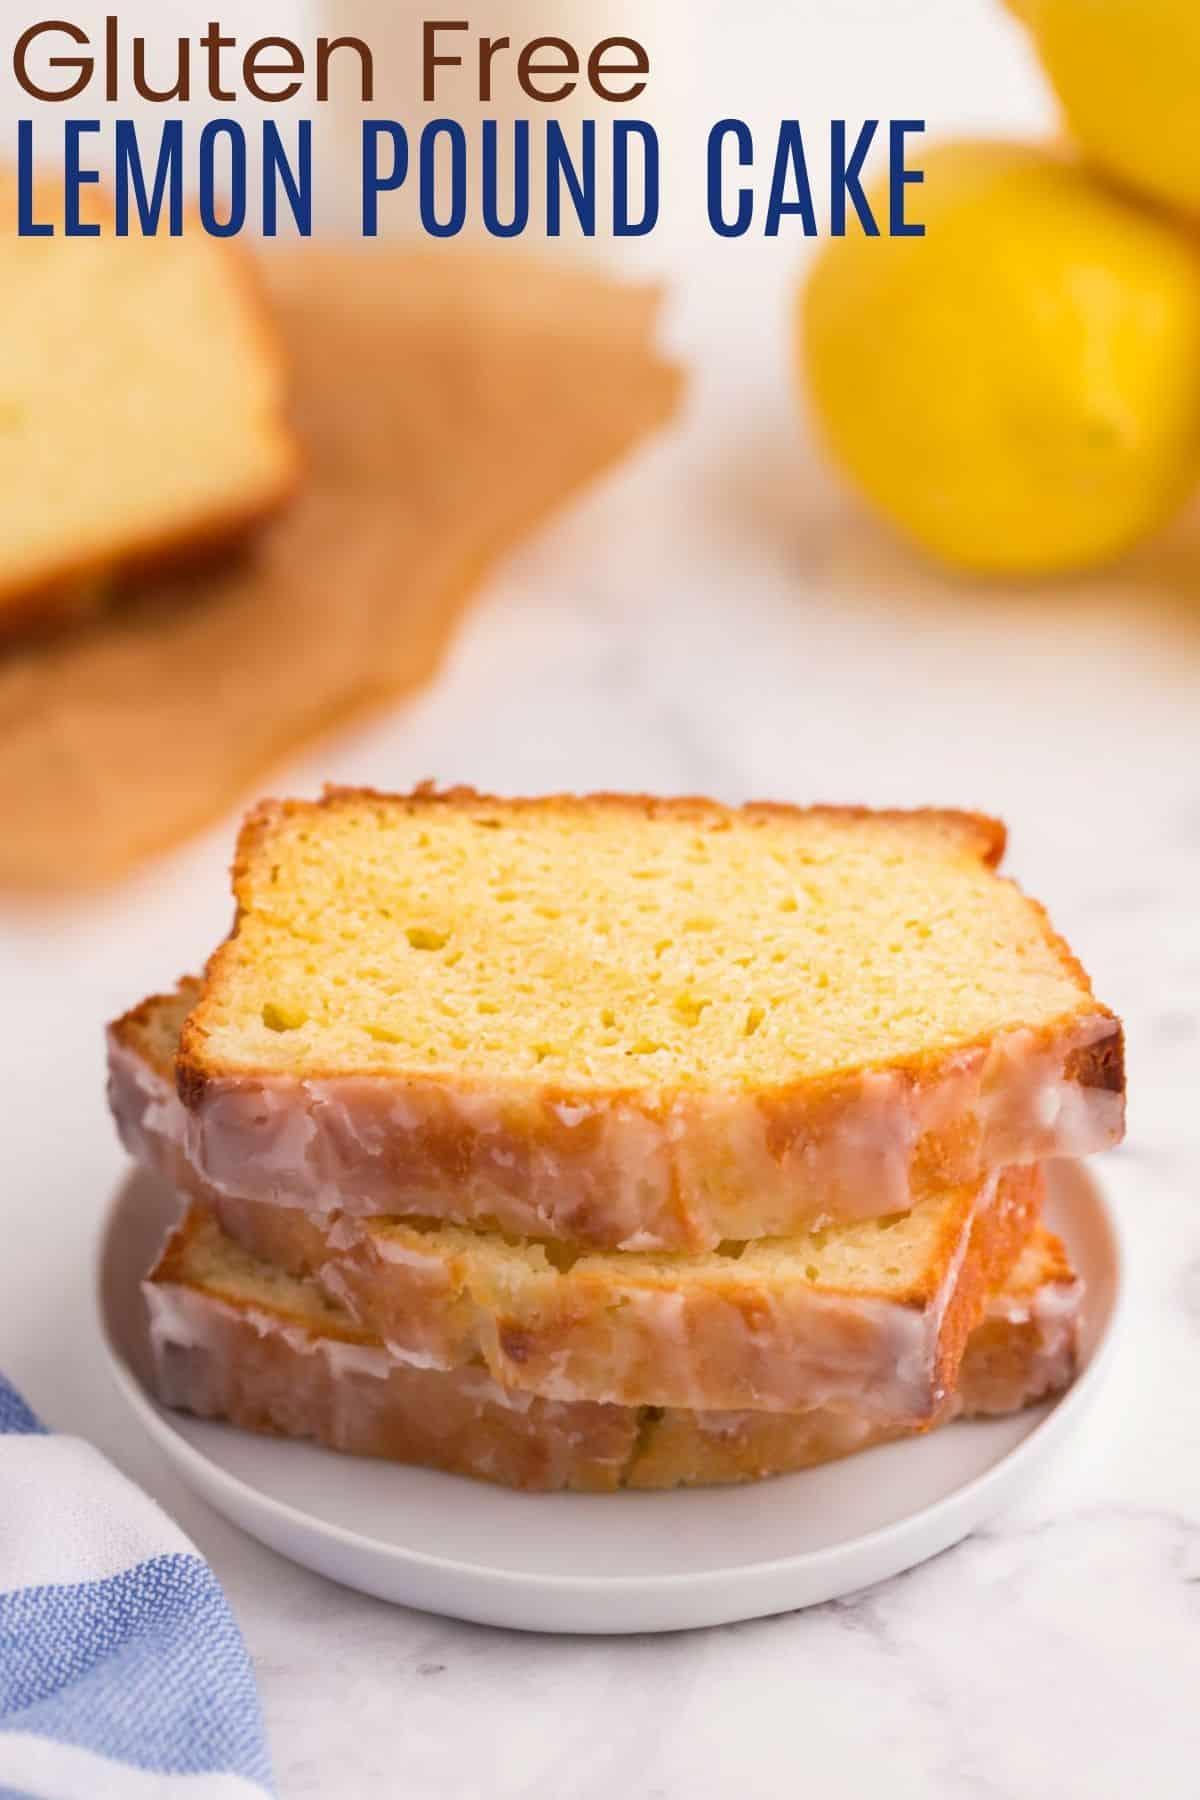 Sliced lemon loaf cake on a white platter